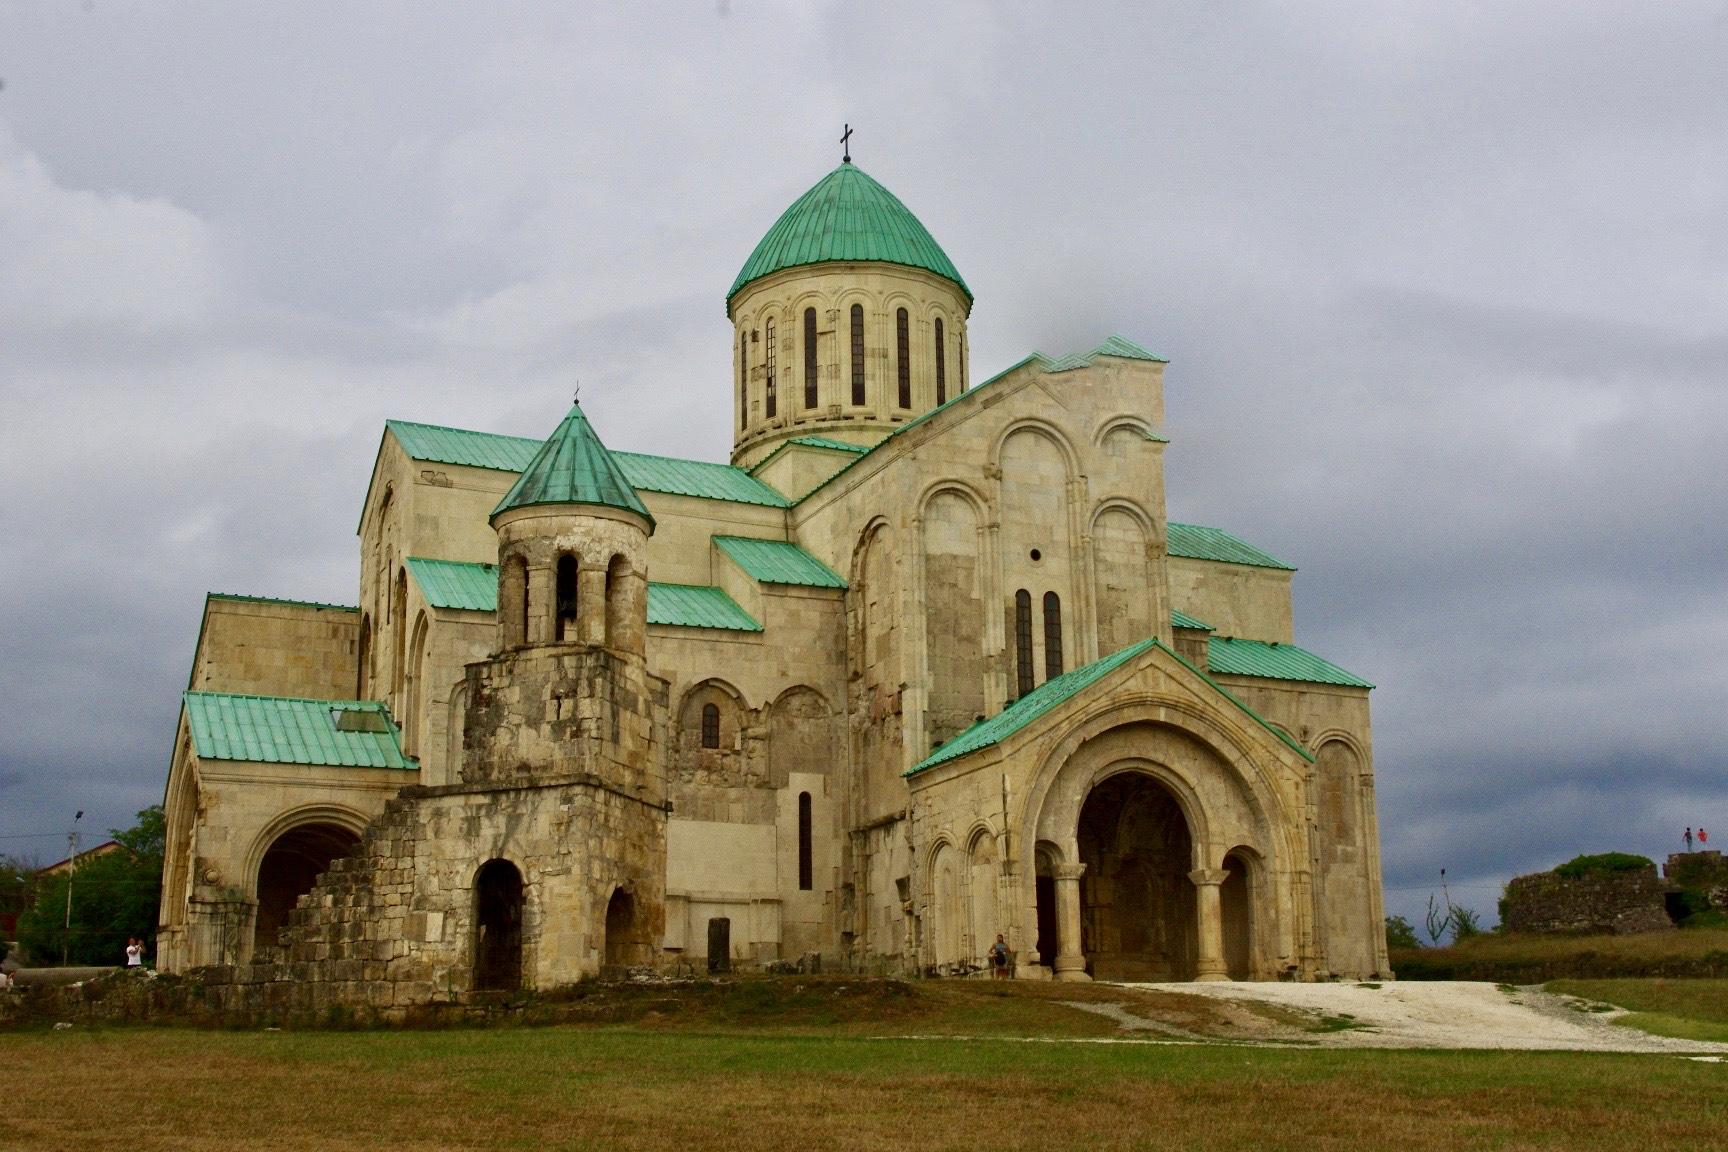 Bagrati-Kathedrale (georg. ბაგრატი; ბაგრატის ტაძარი)